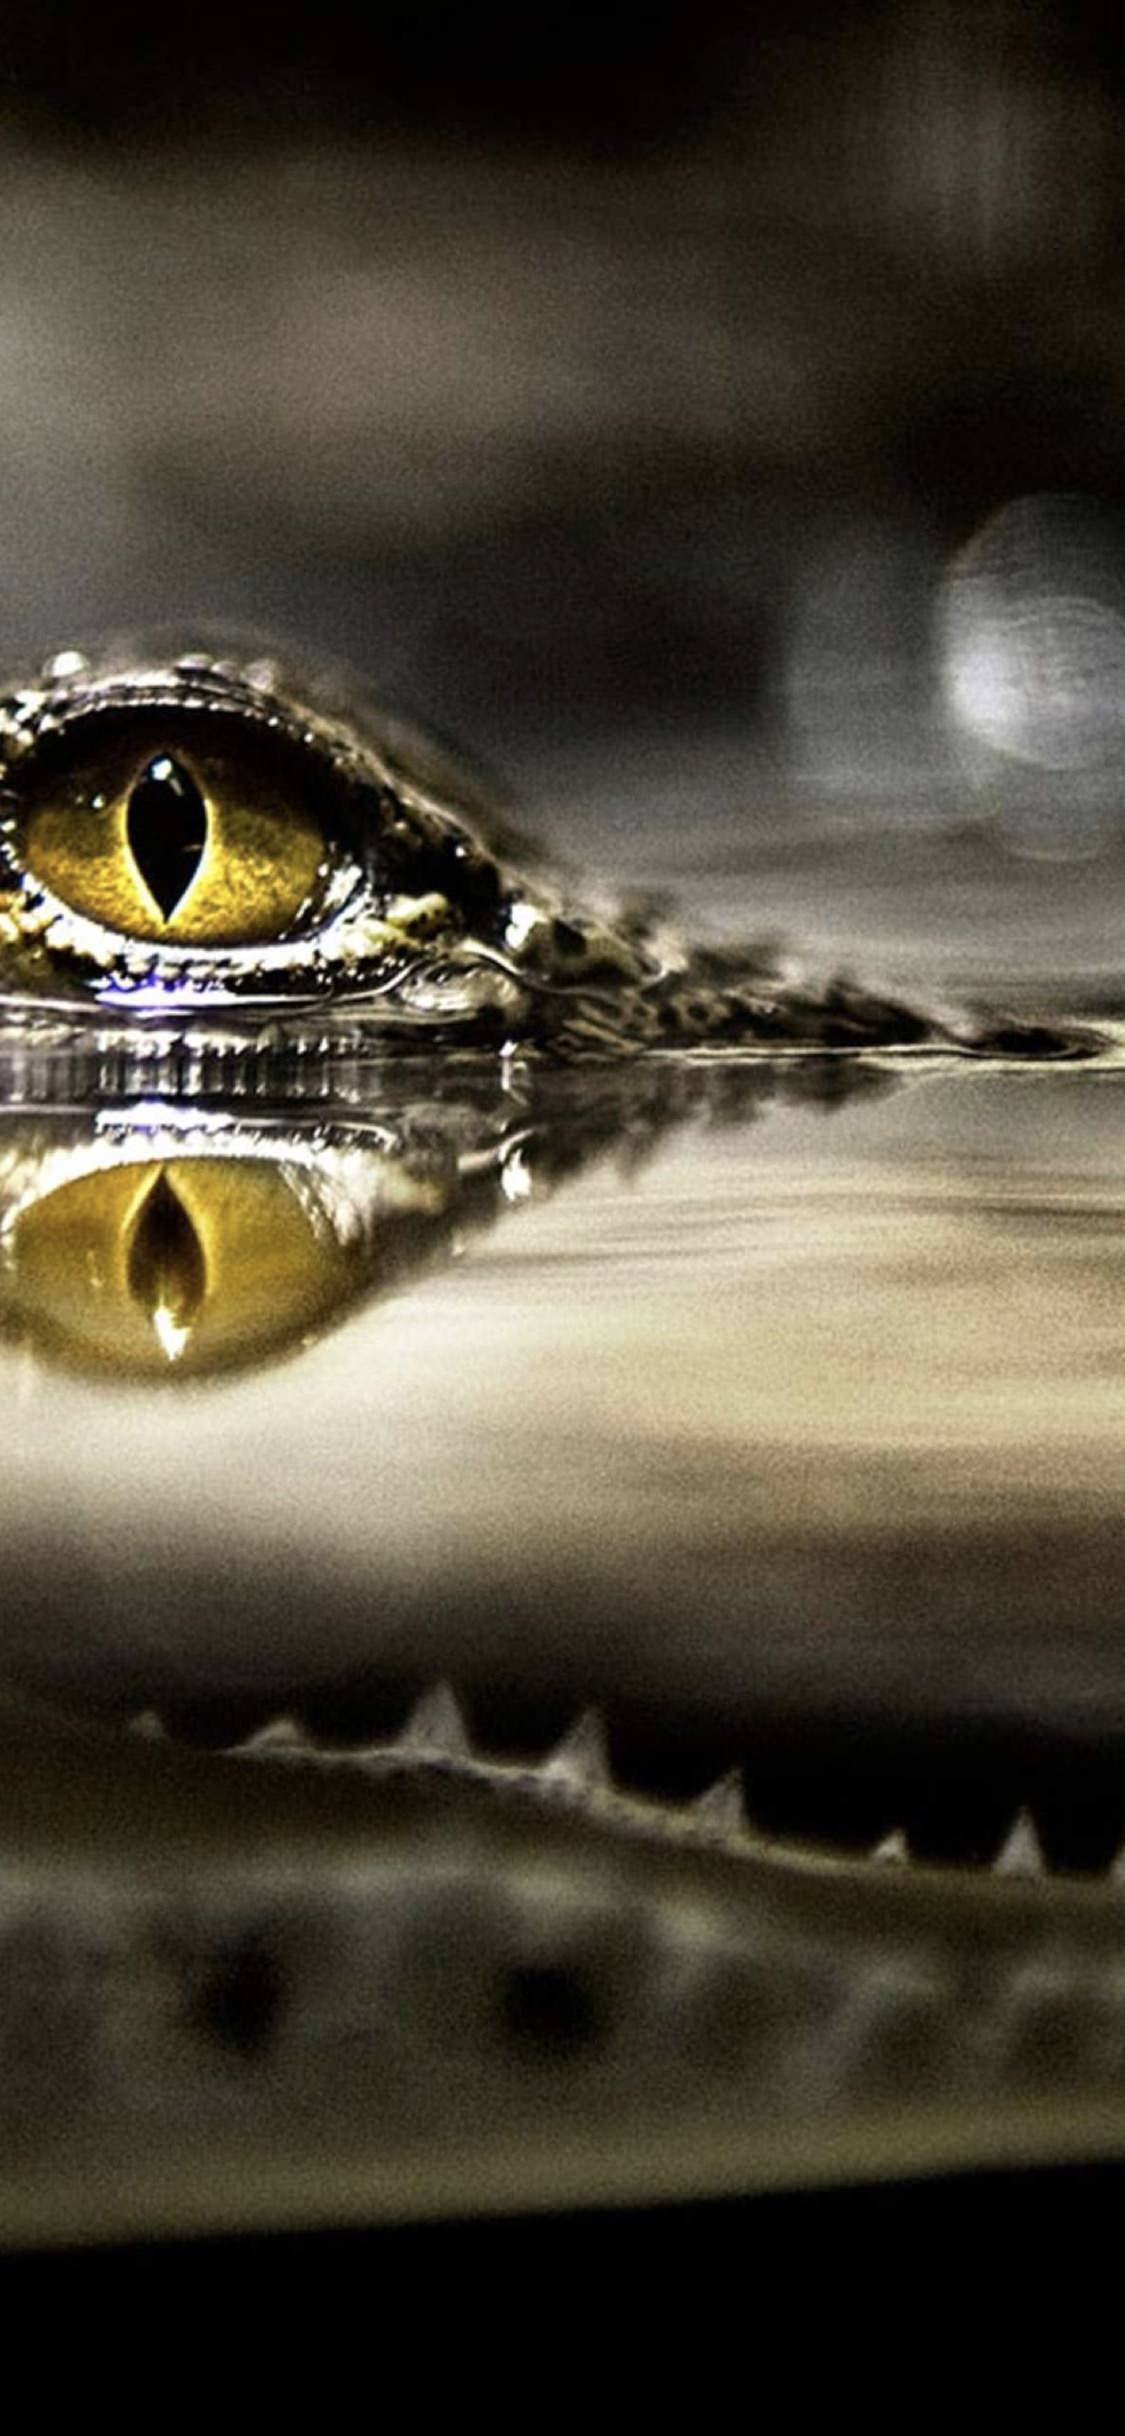 Cool Water Crocodile Wallpaper Sc Iphonexs